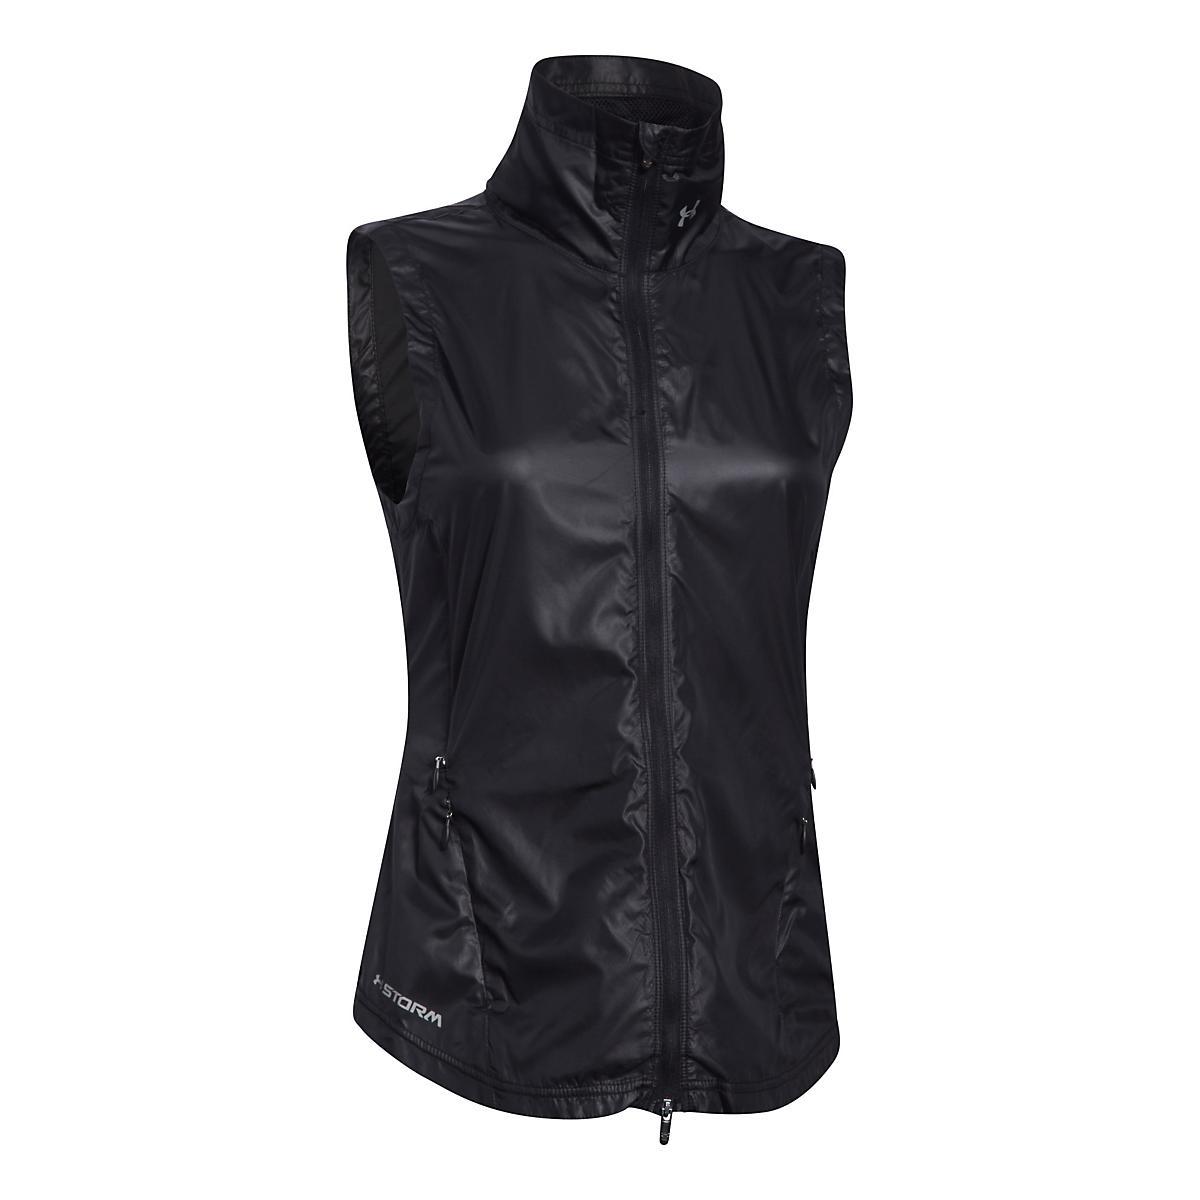 Women's Under Armour�Storm Layered Up Vest